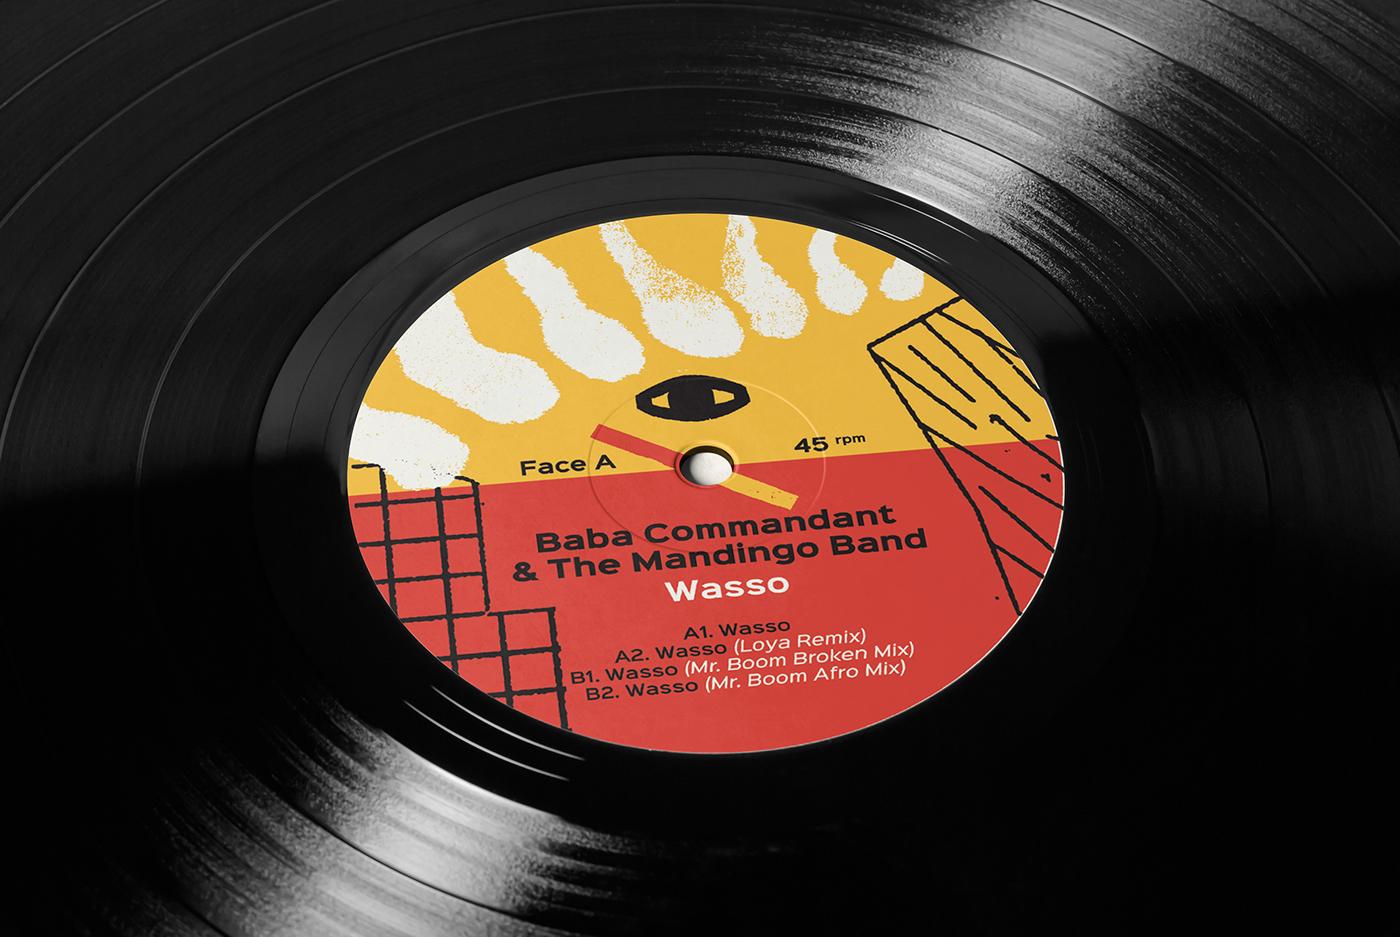 Baba Commandant Amp The Mandingo Band Vinyl Cover On Behance